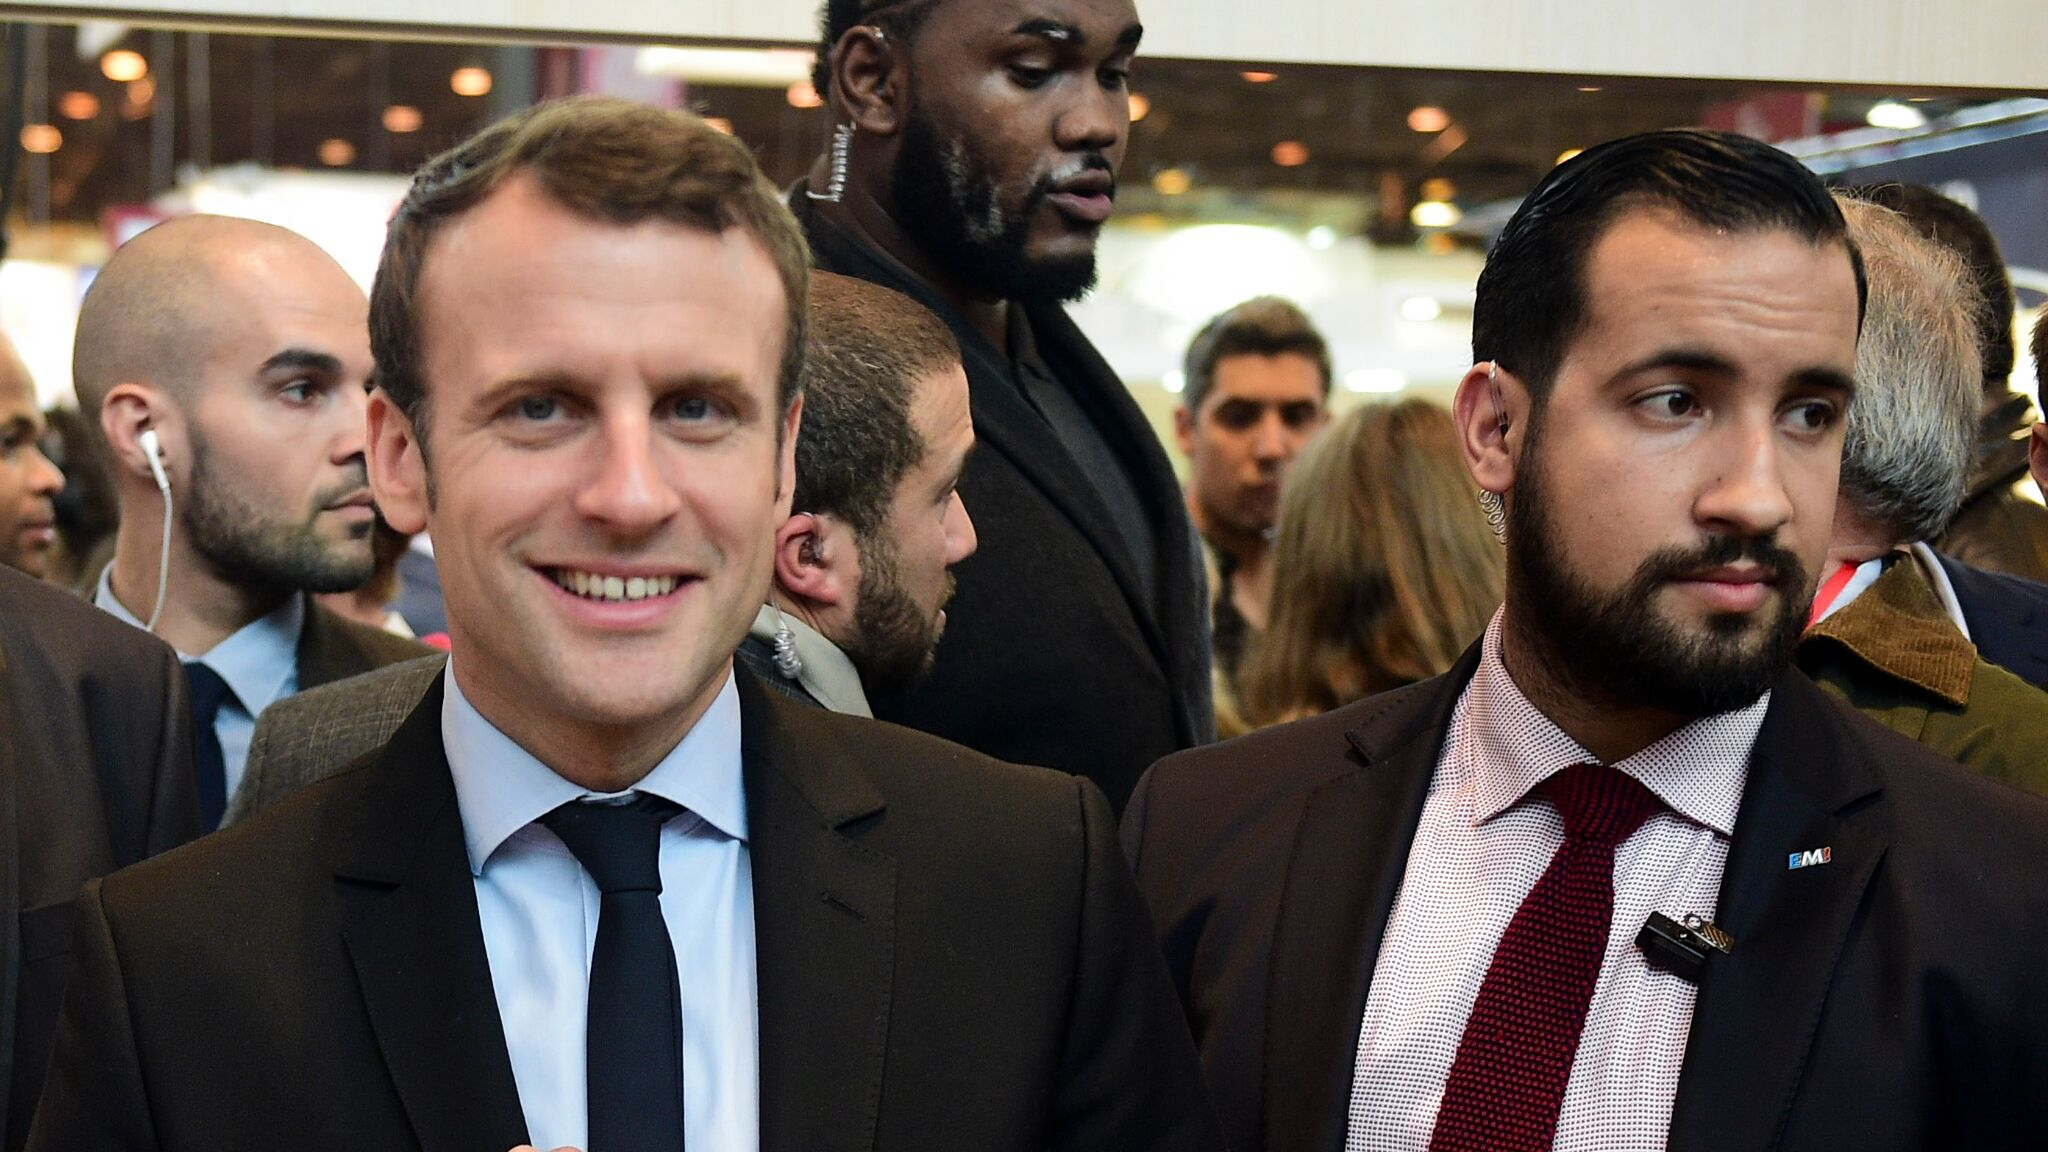 Emmanuel Macron Insulte Alexandre Benalla Et Avoue Lui Avoir